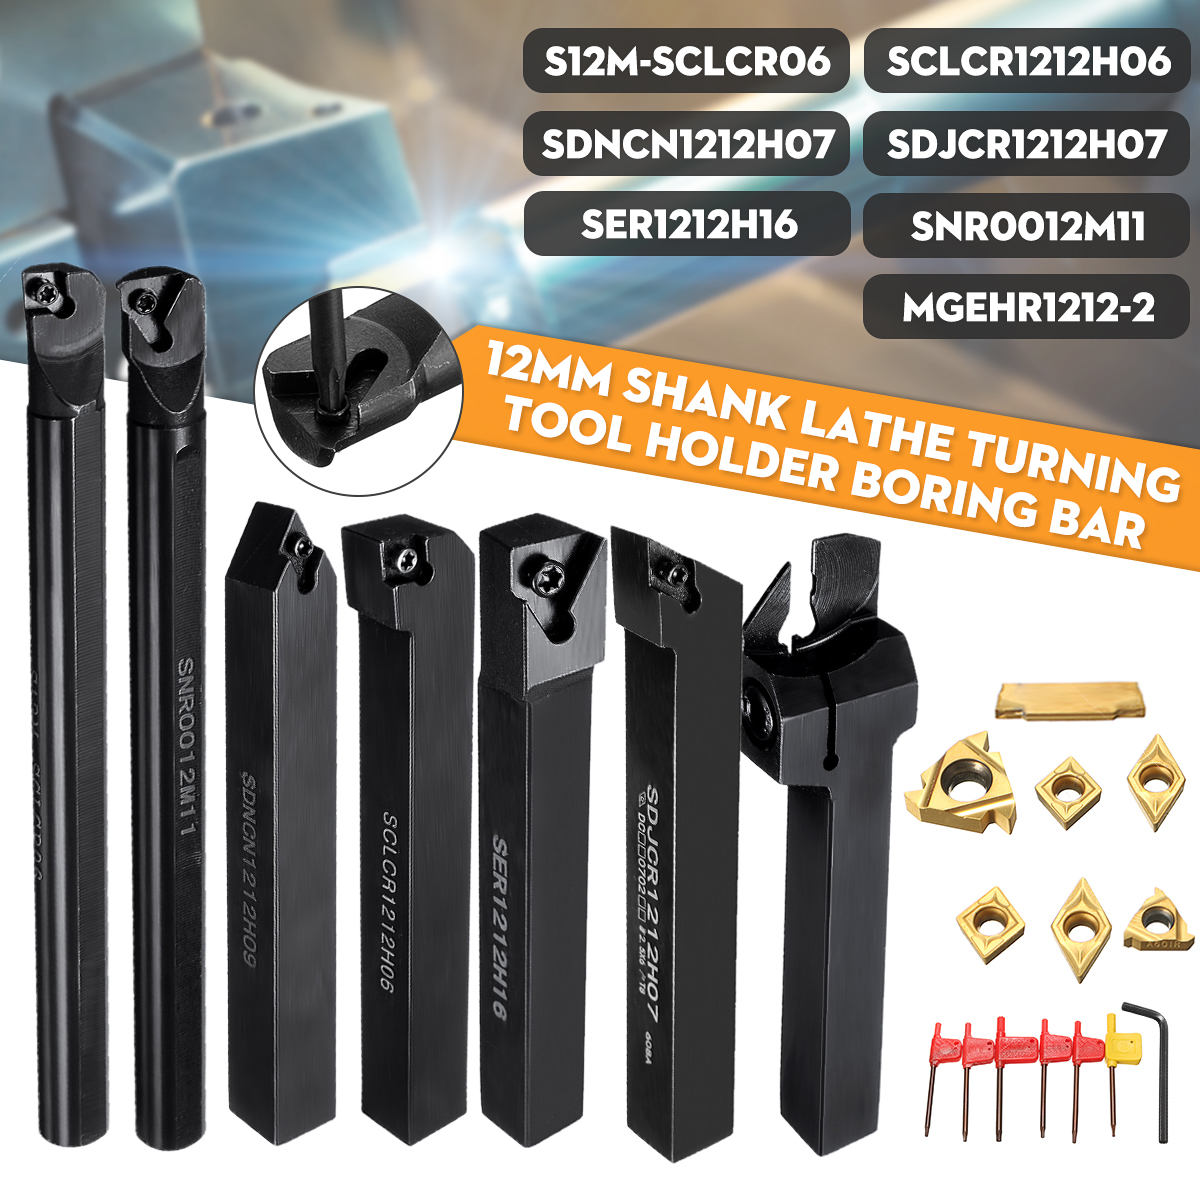 21 pçs/set 12 milímetros Shank Torno Virando Ferramenta Chato Titular Bar + Insert + Chave S12M-SCLCR06/SER1212H16/SCL1212H06